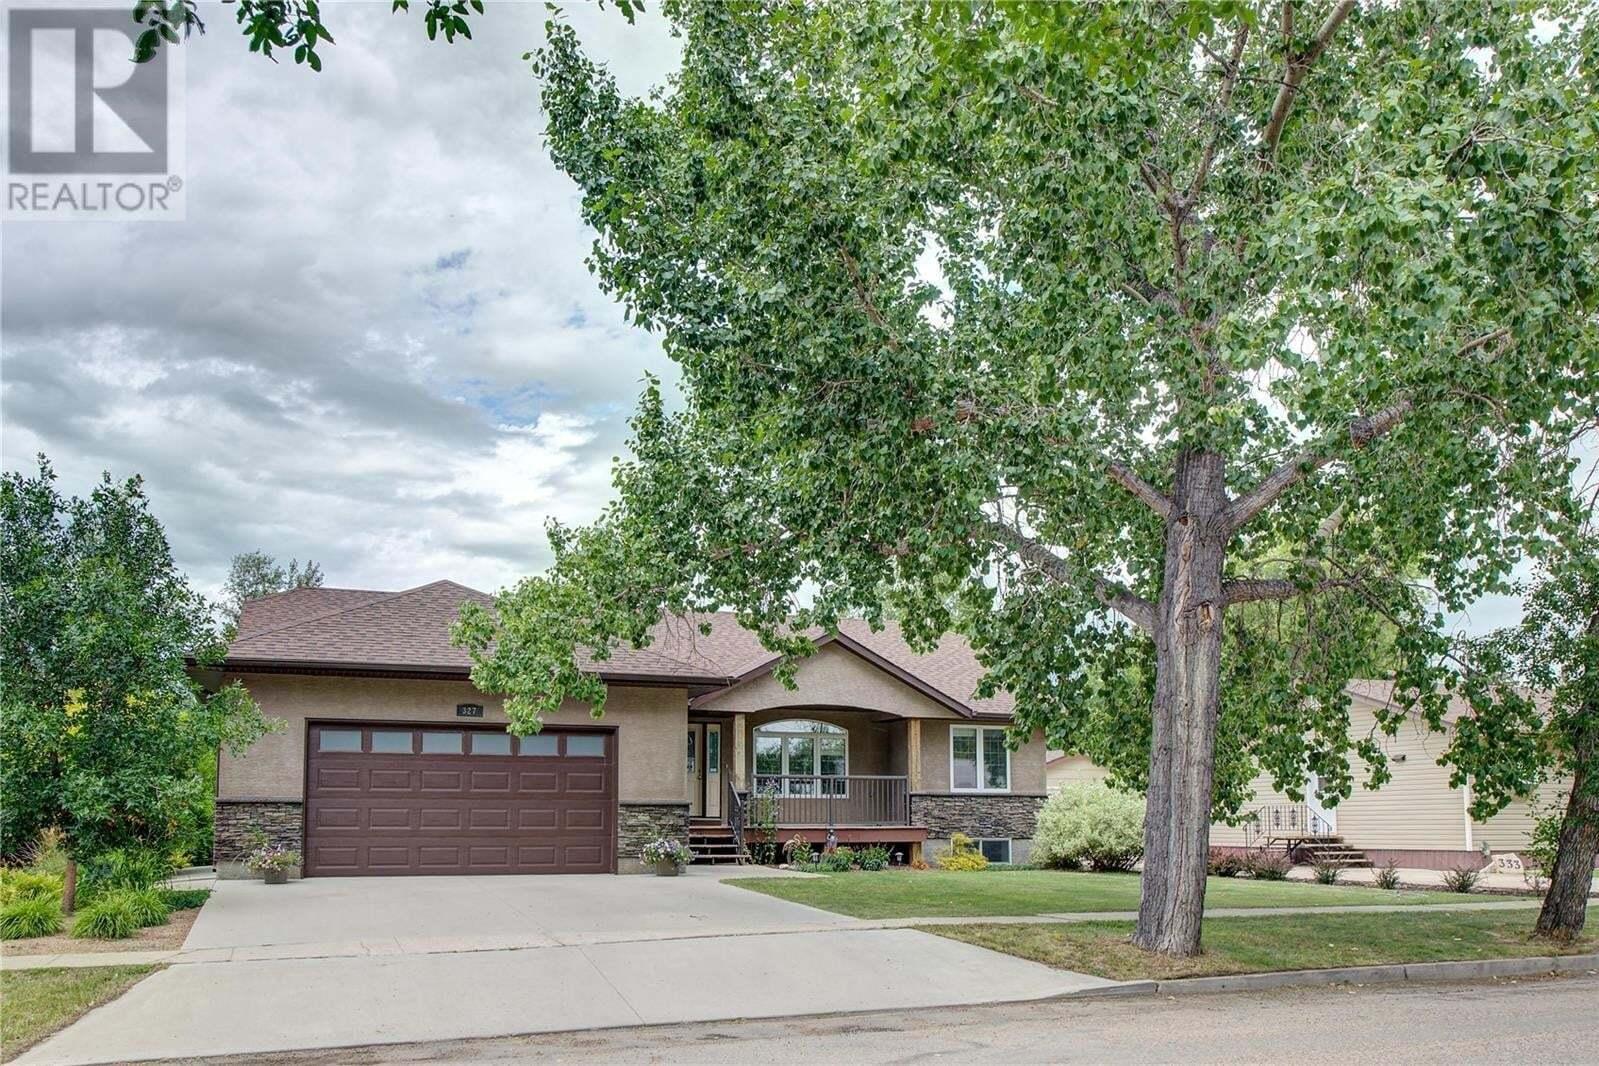 House for sale at 327 Garfield St Davidson Saskatchewan - MLS: SK821100